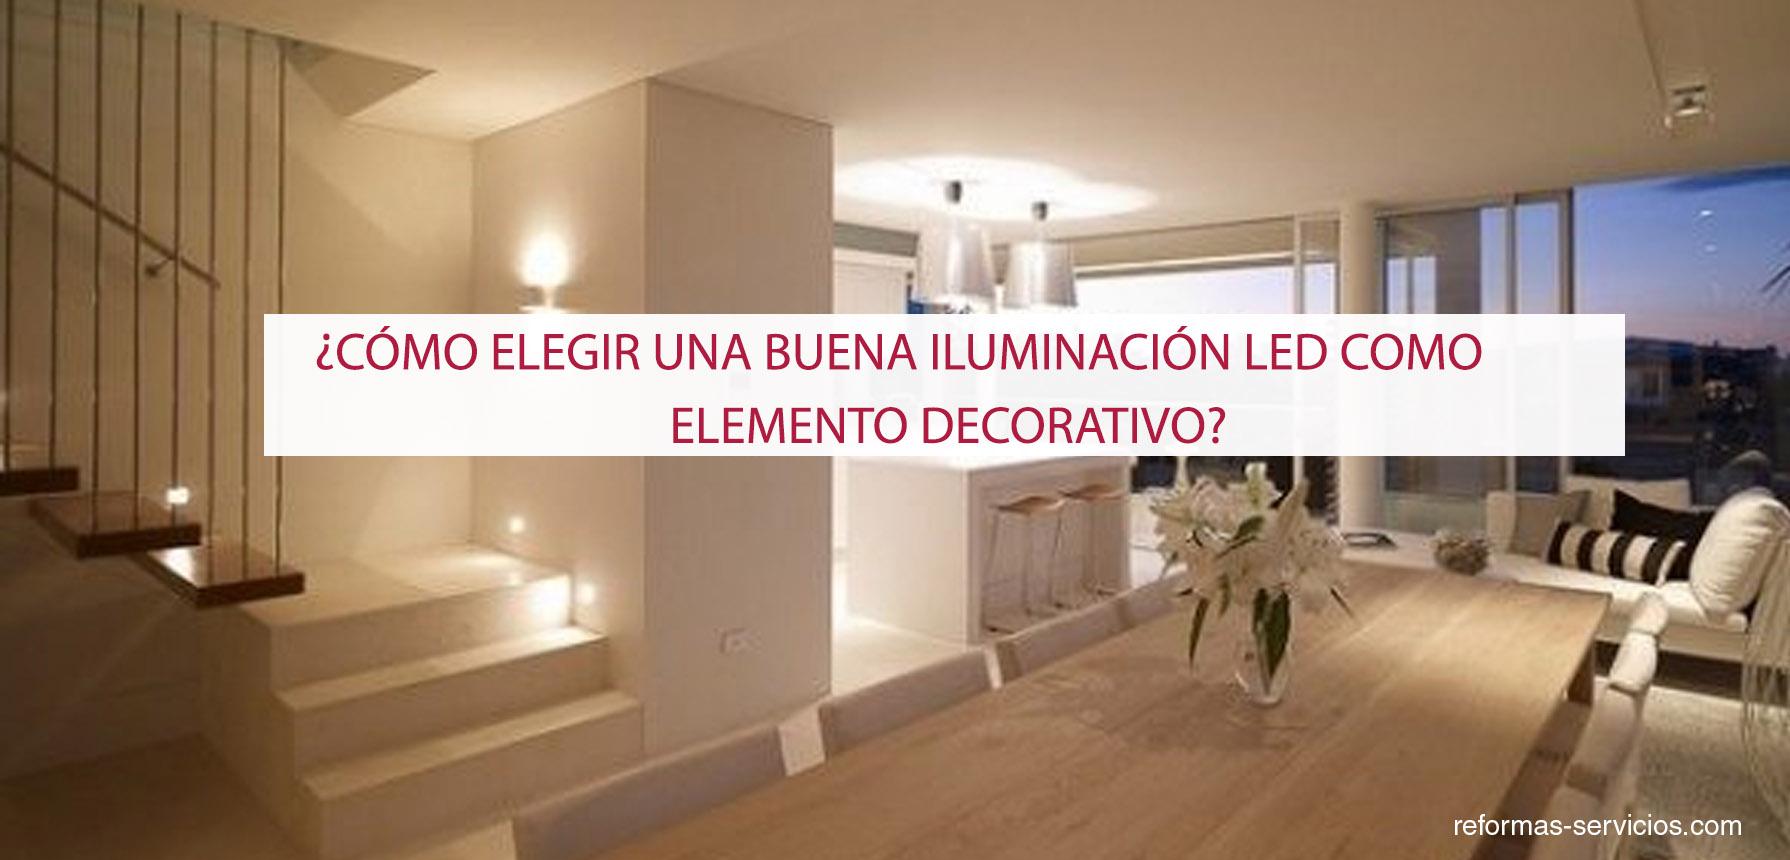 Iluminaci n led for Decoracion led hogar